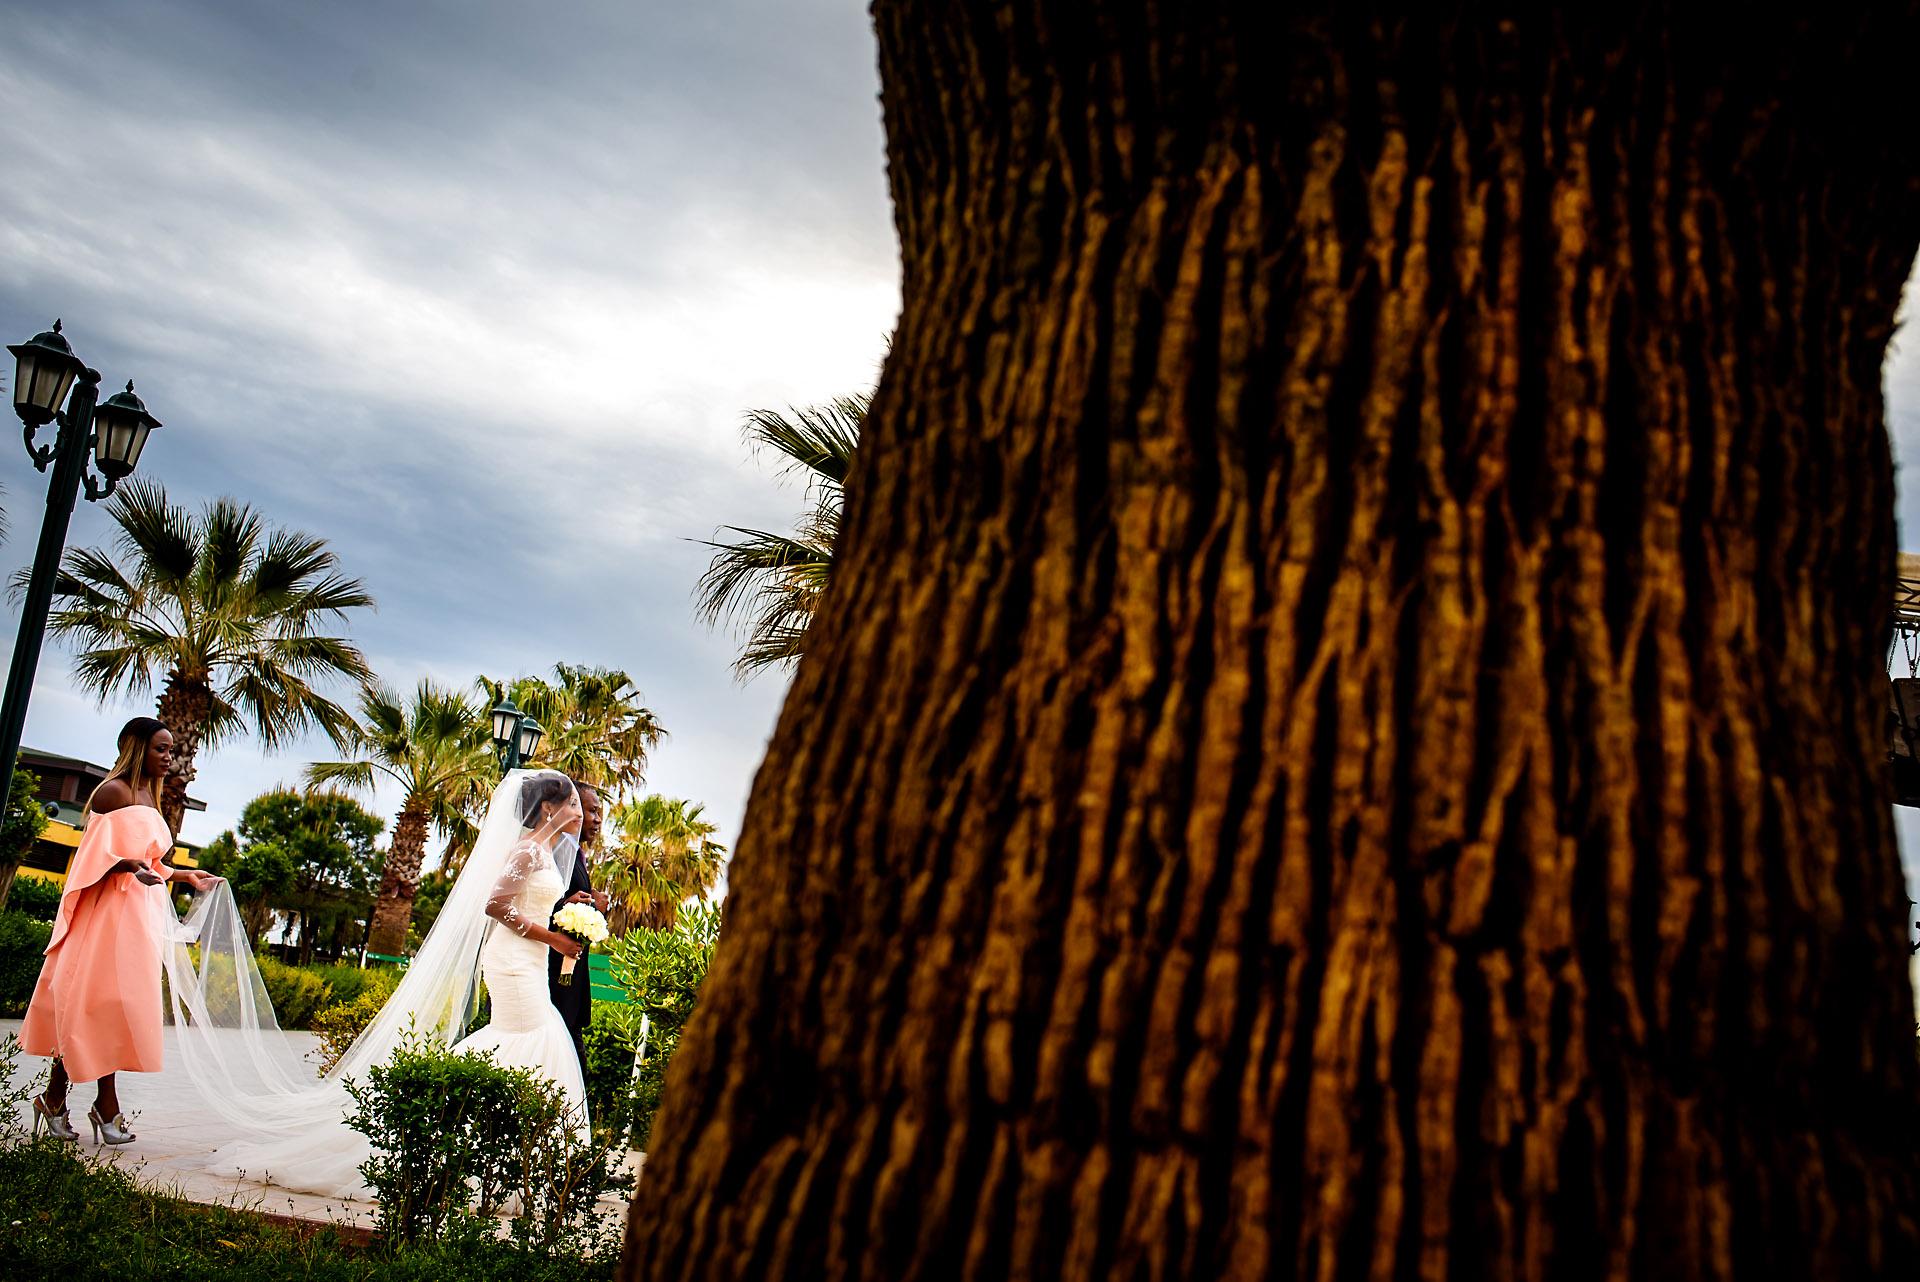 turkey-wedding-photographer21.jpg